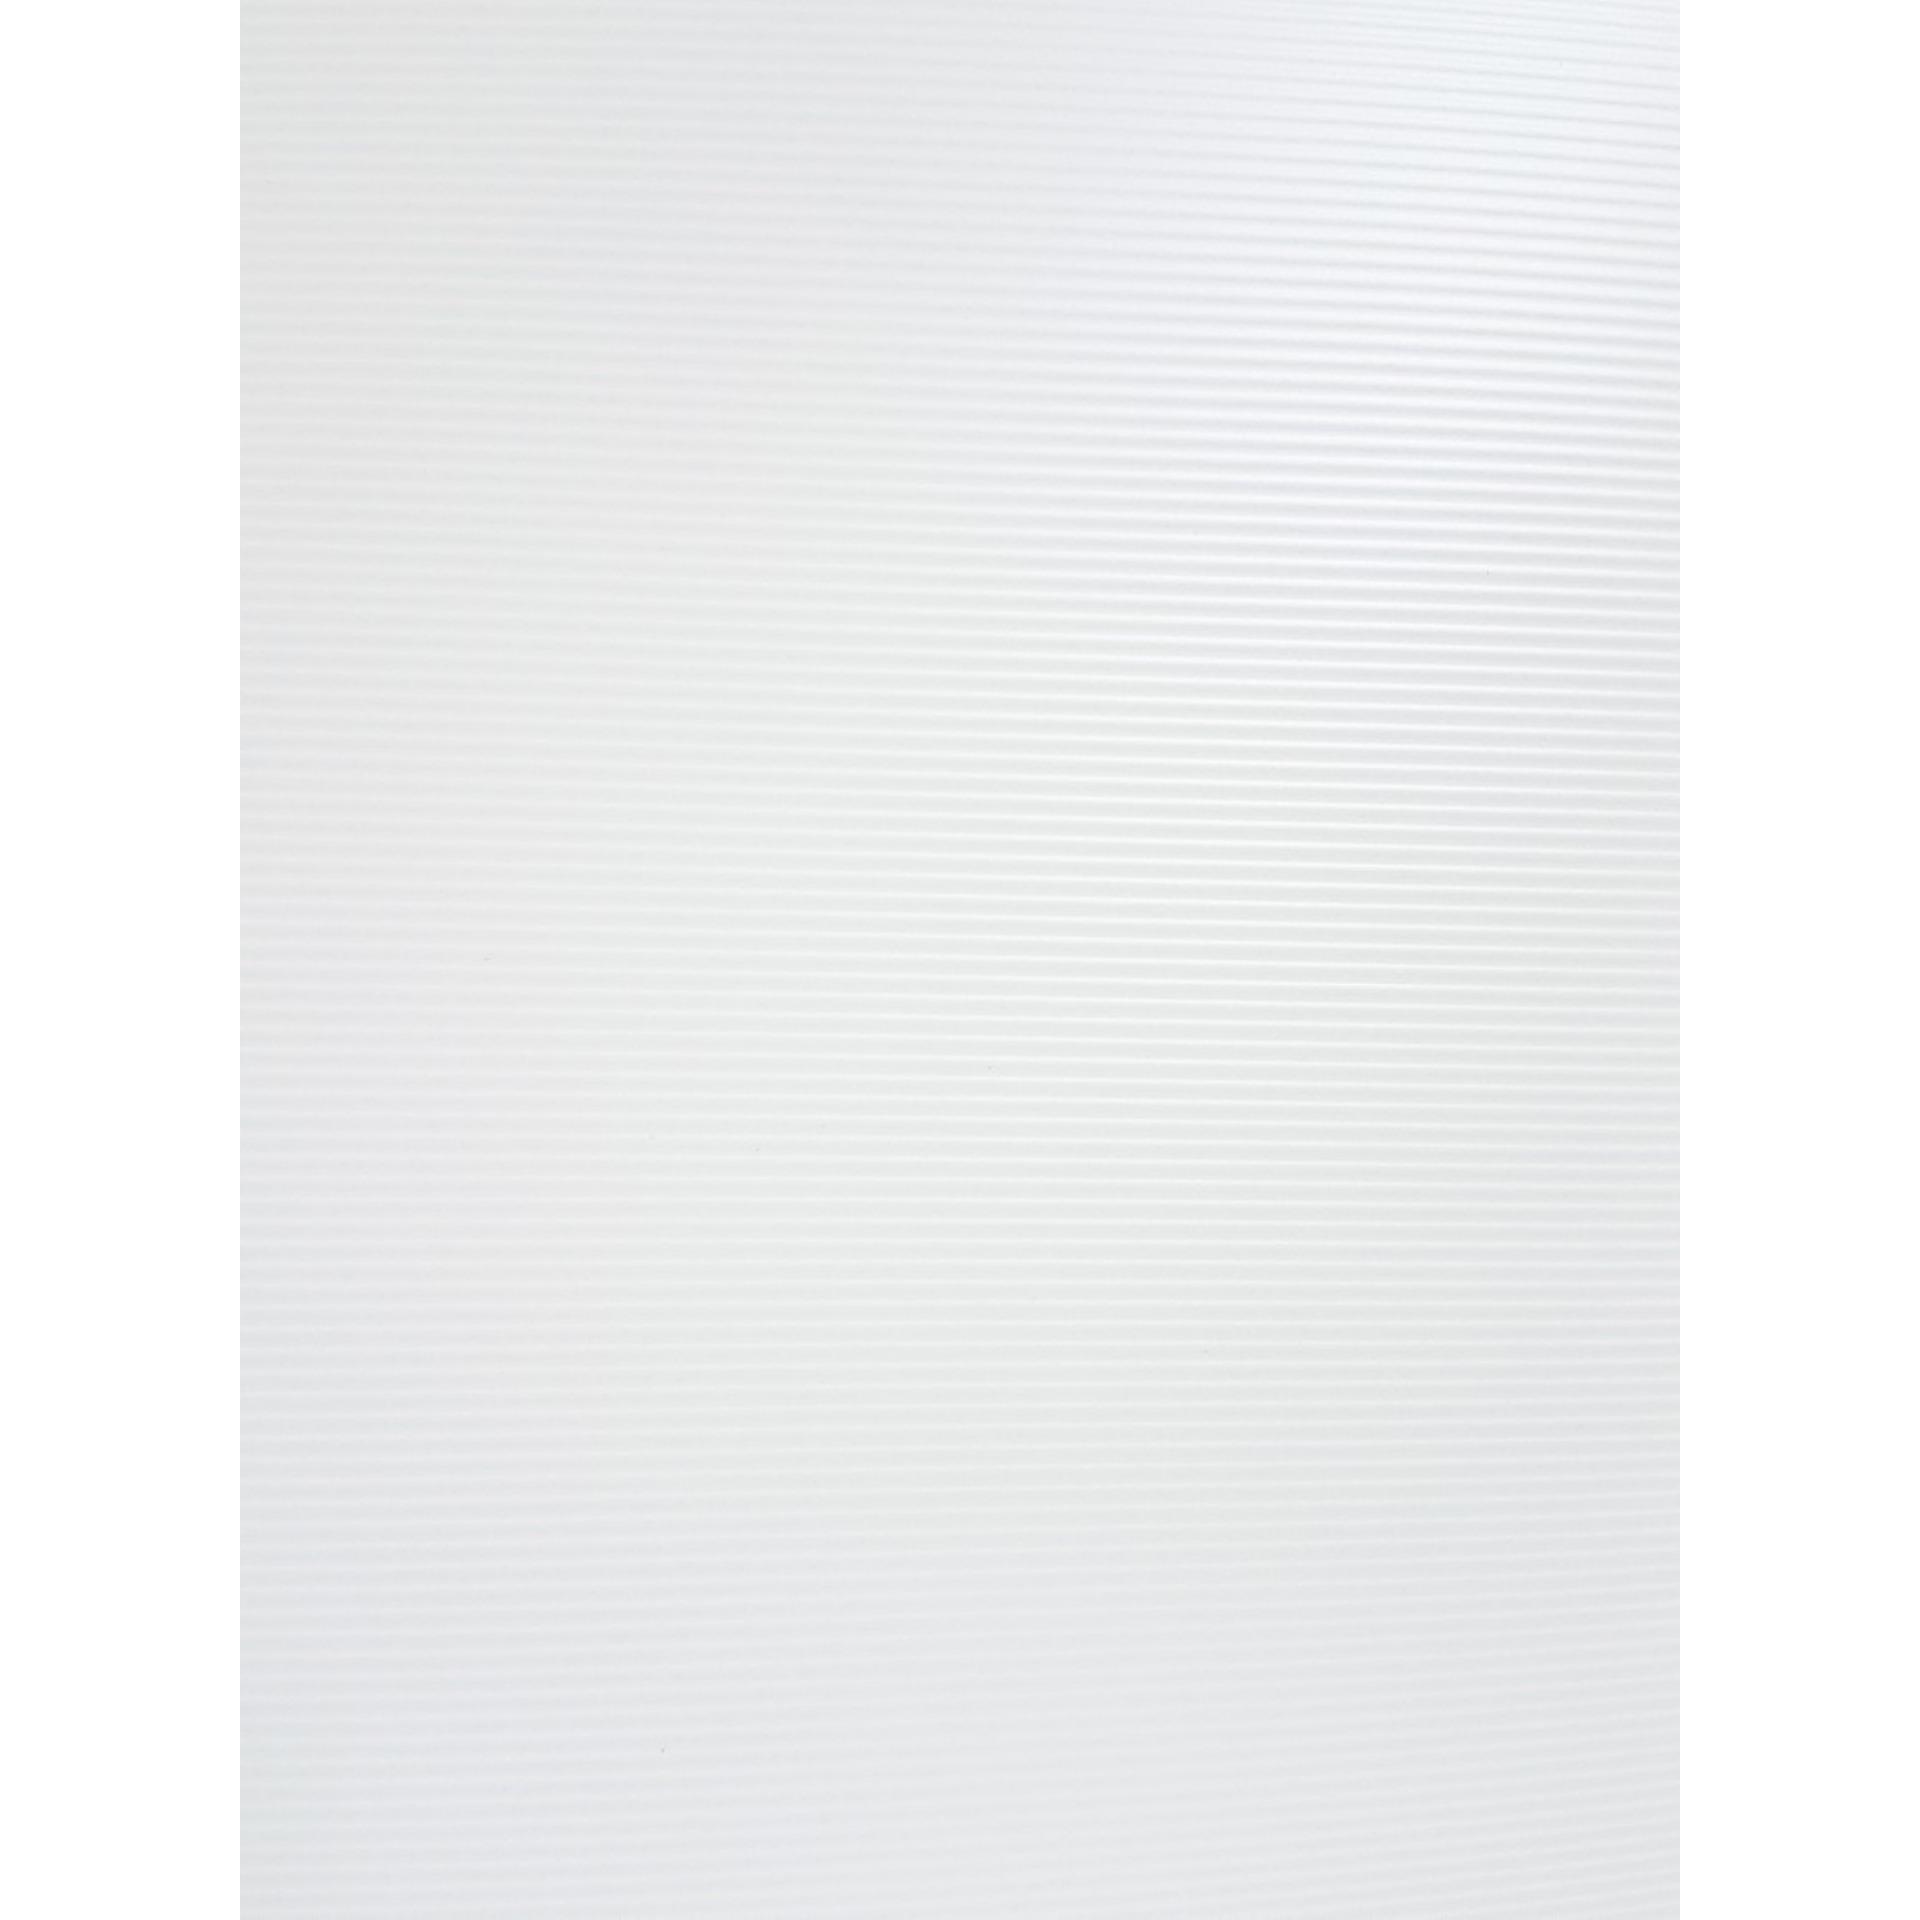 WOL - Laminate 4 x 8 thickness 0.8 mm Sheets - Waveline Cloud - HPL